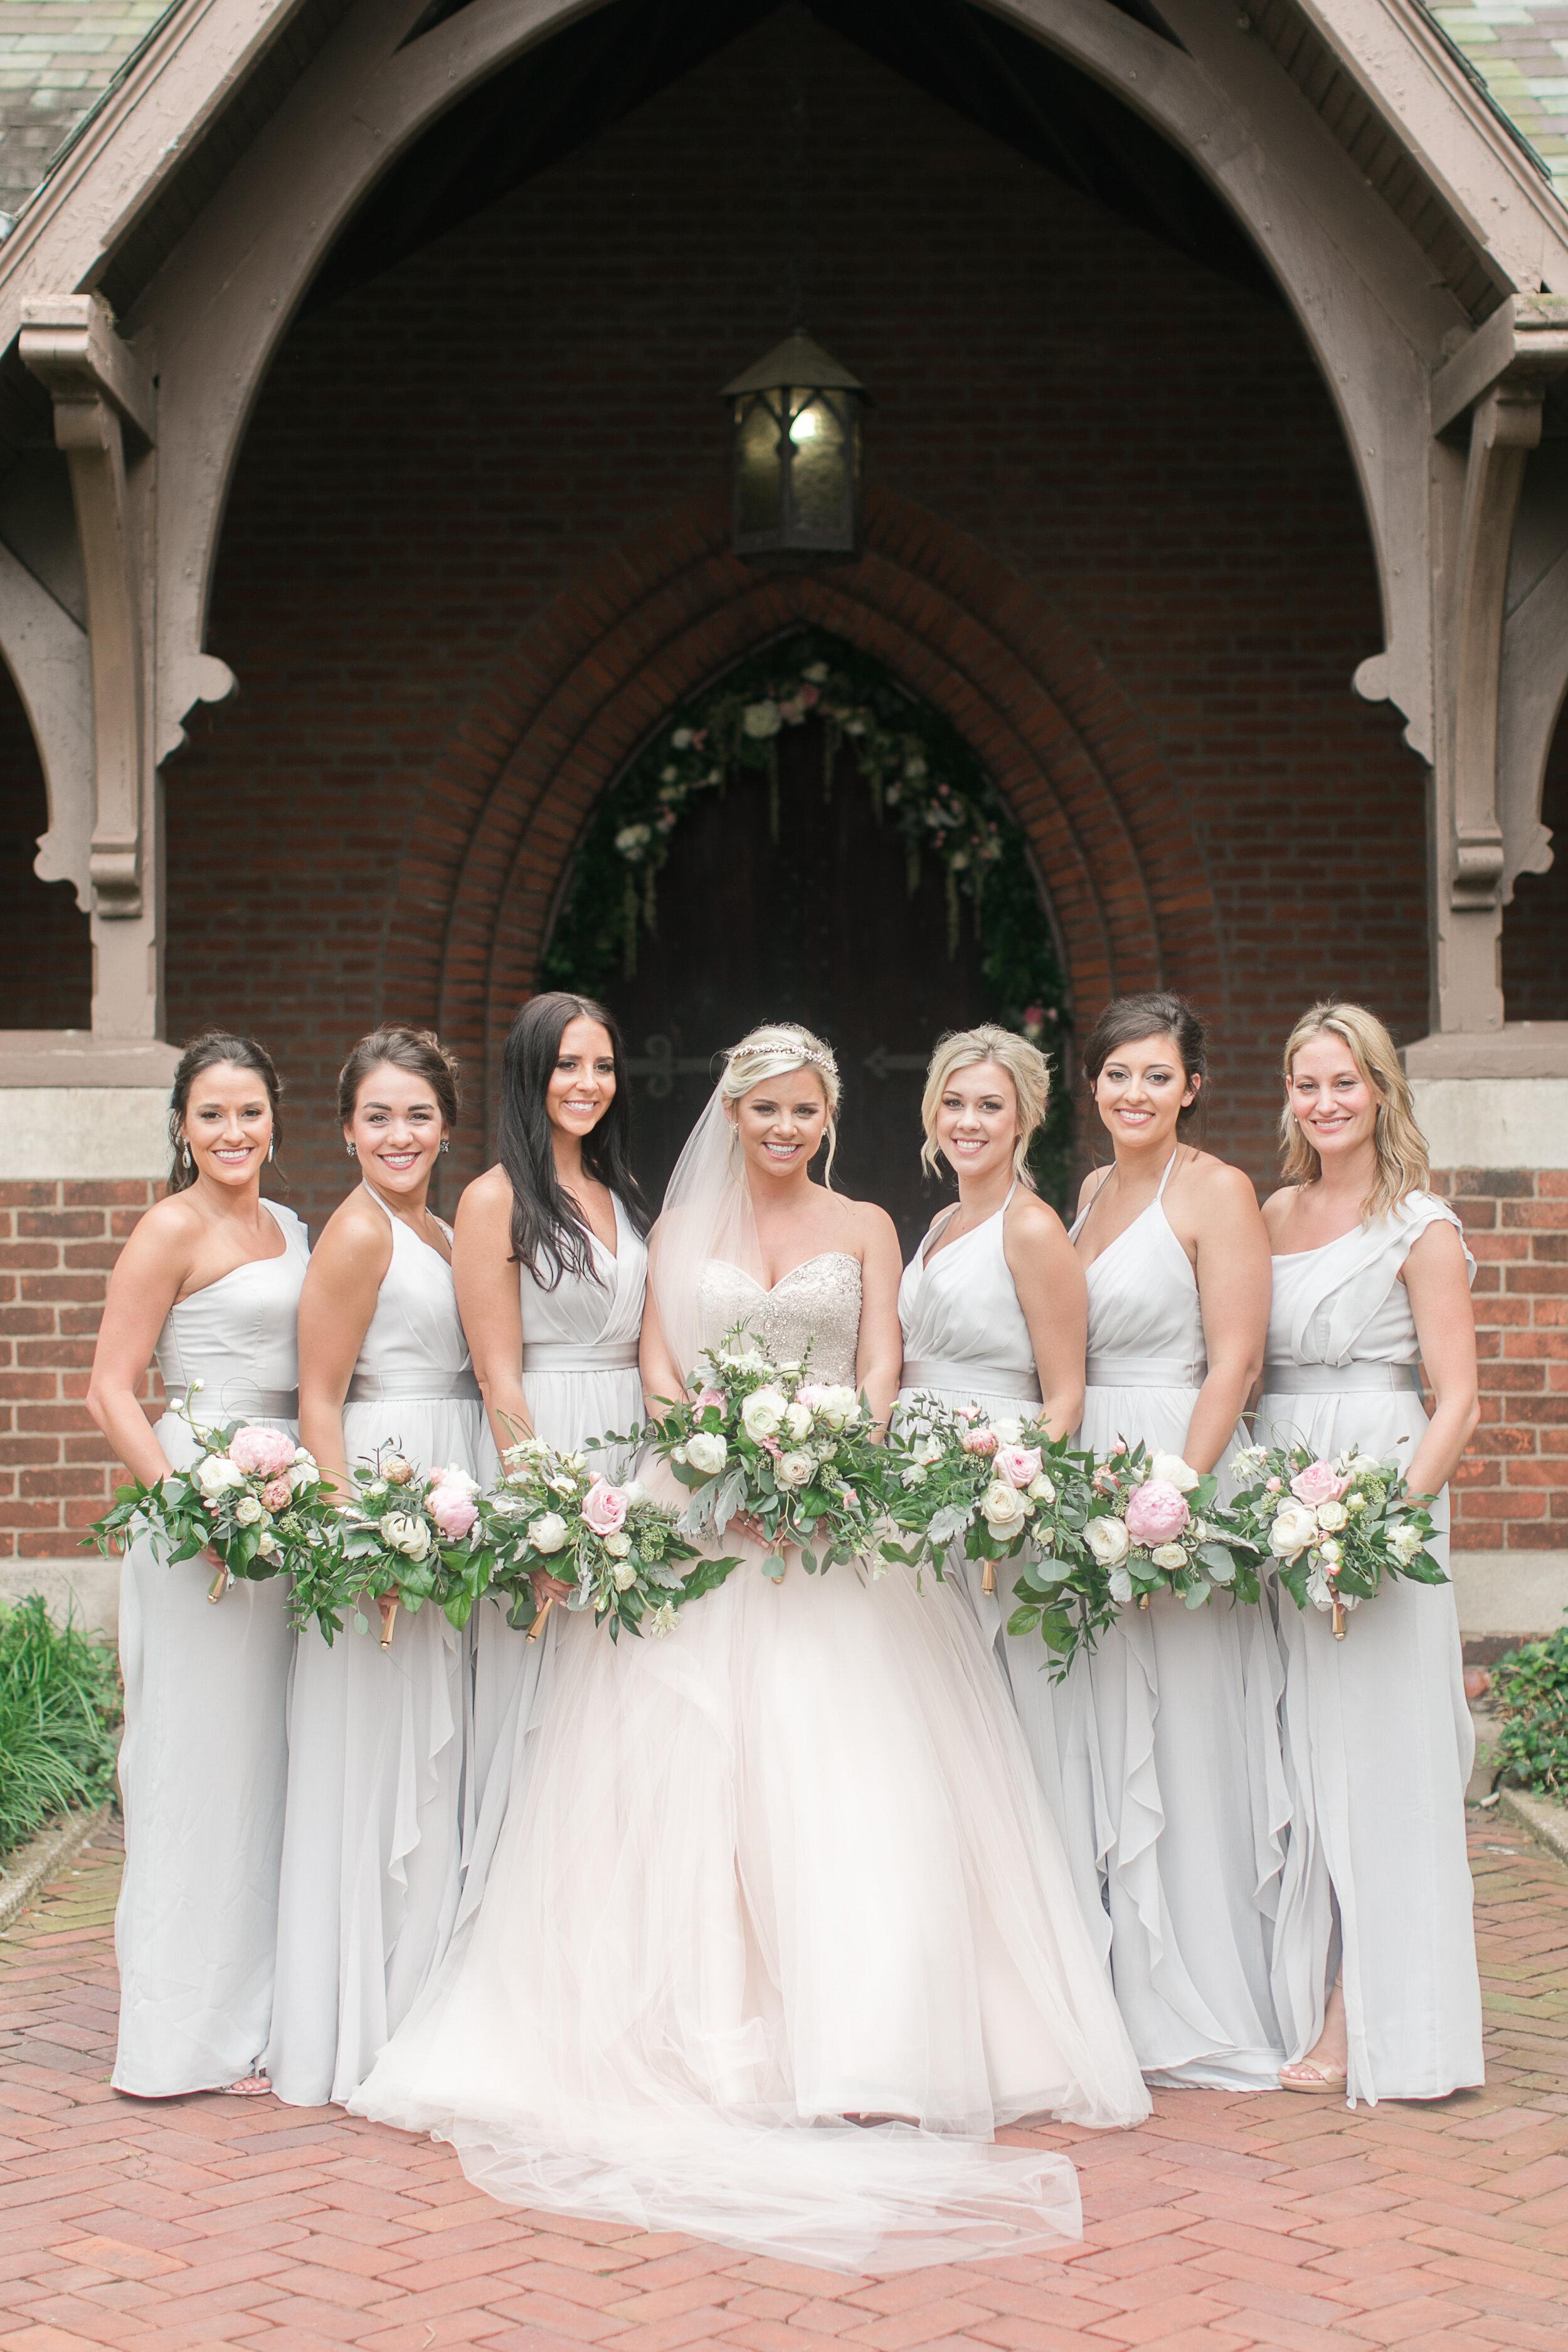 Holly-David-wedding-362.jpg